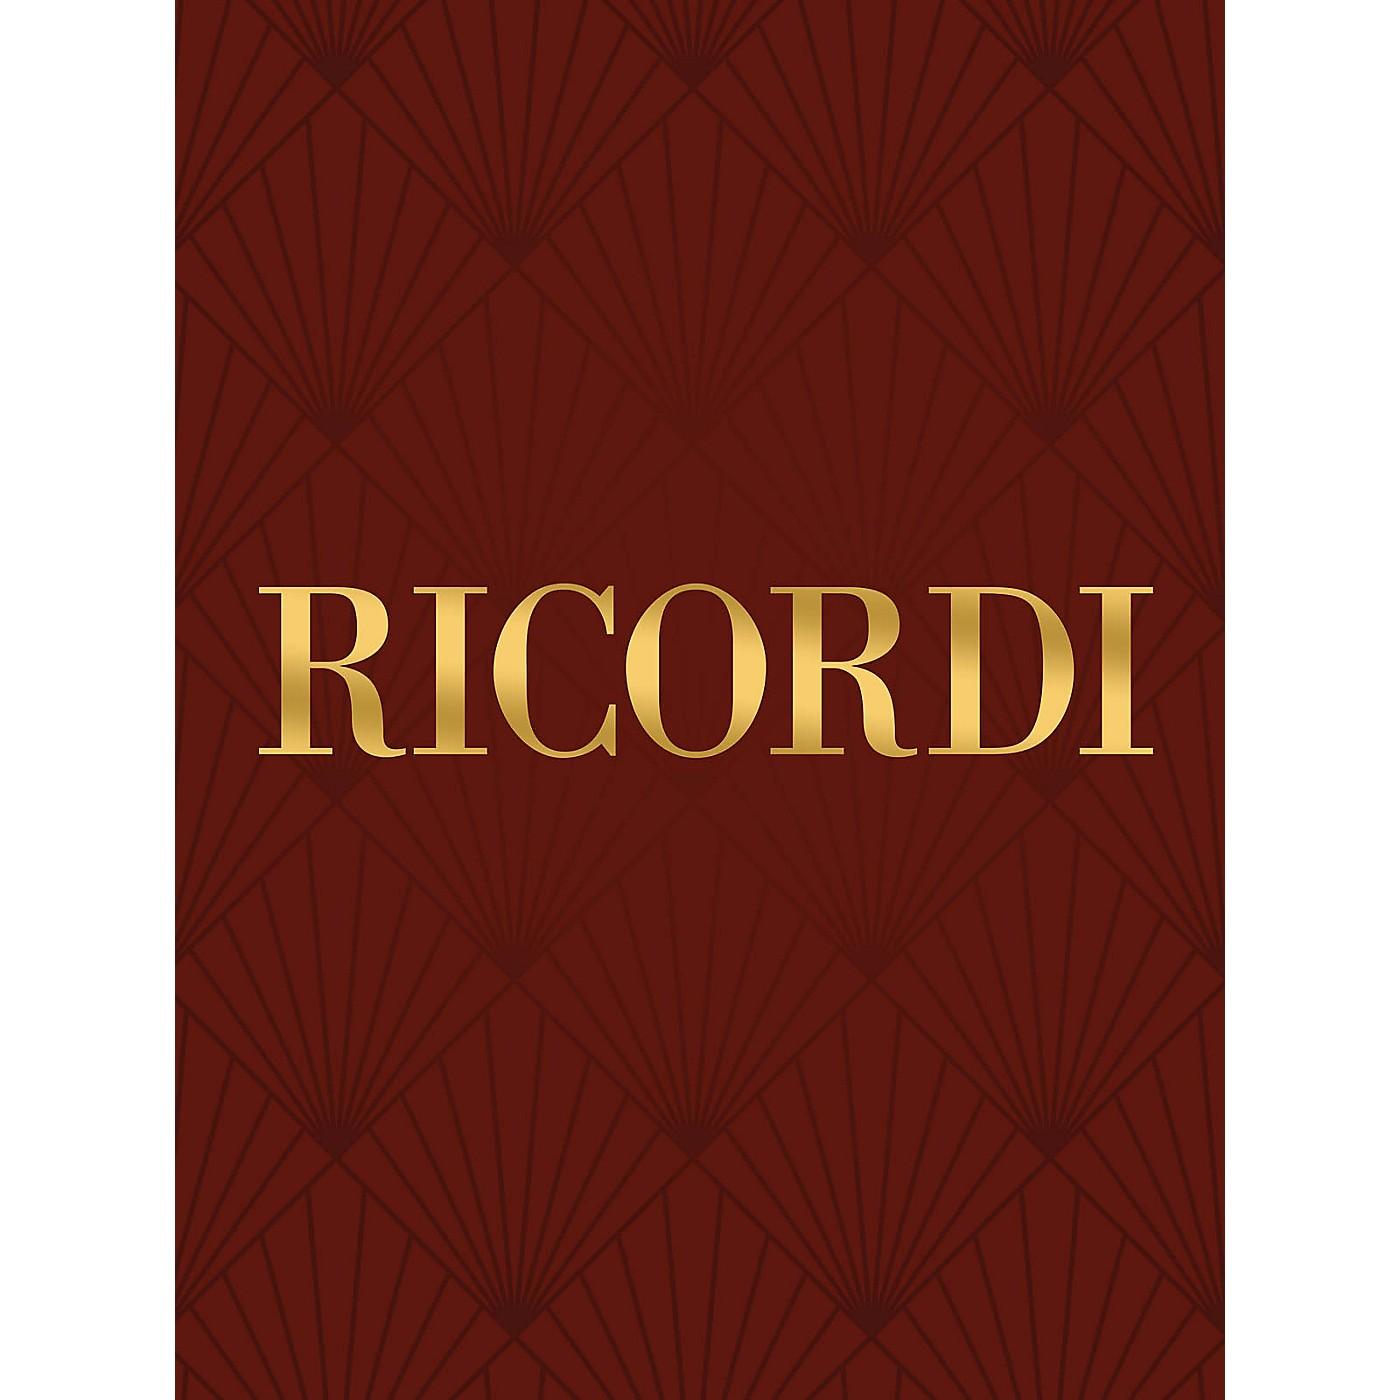 Ricordi Laudate pueri Dominum RV601 (Vocal Score) SATB Composed by Antonio Vivaldi Edited by Angelo Ephrikian thumbnail